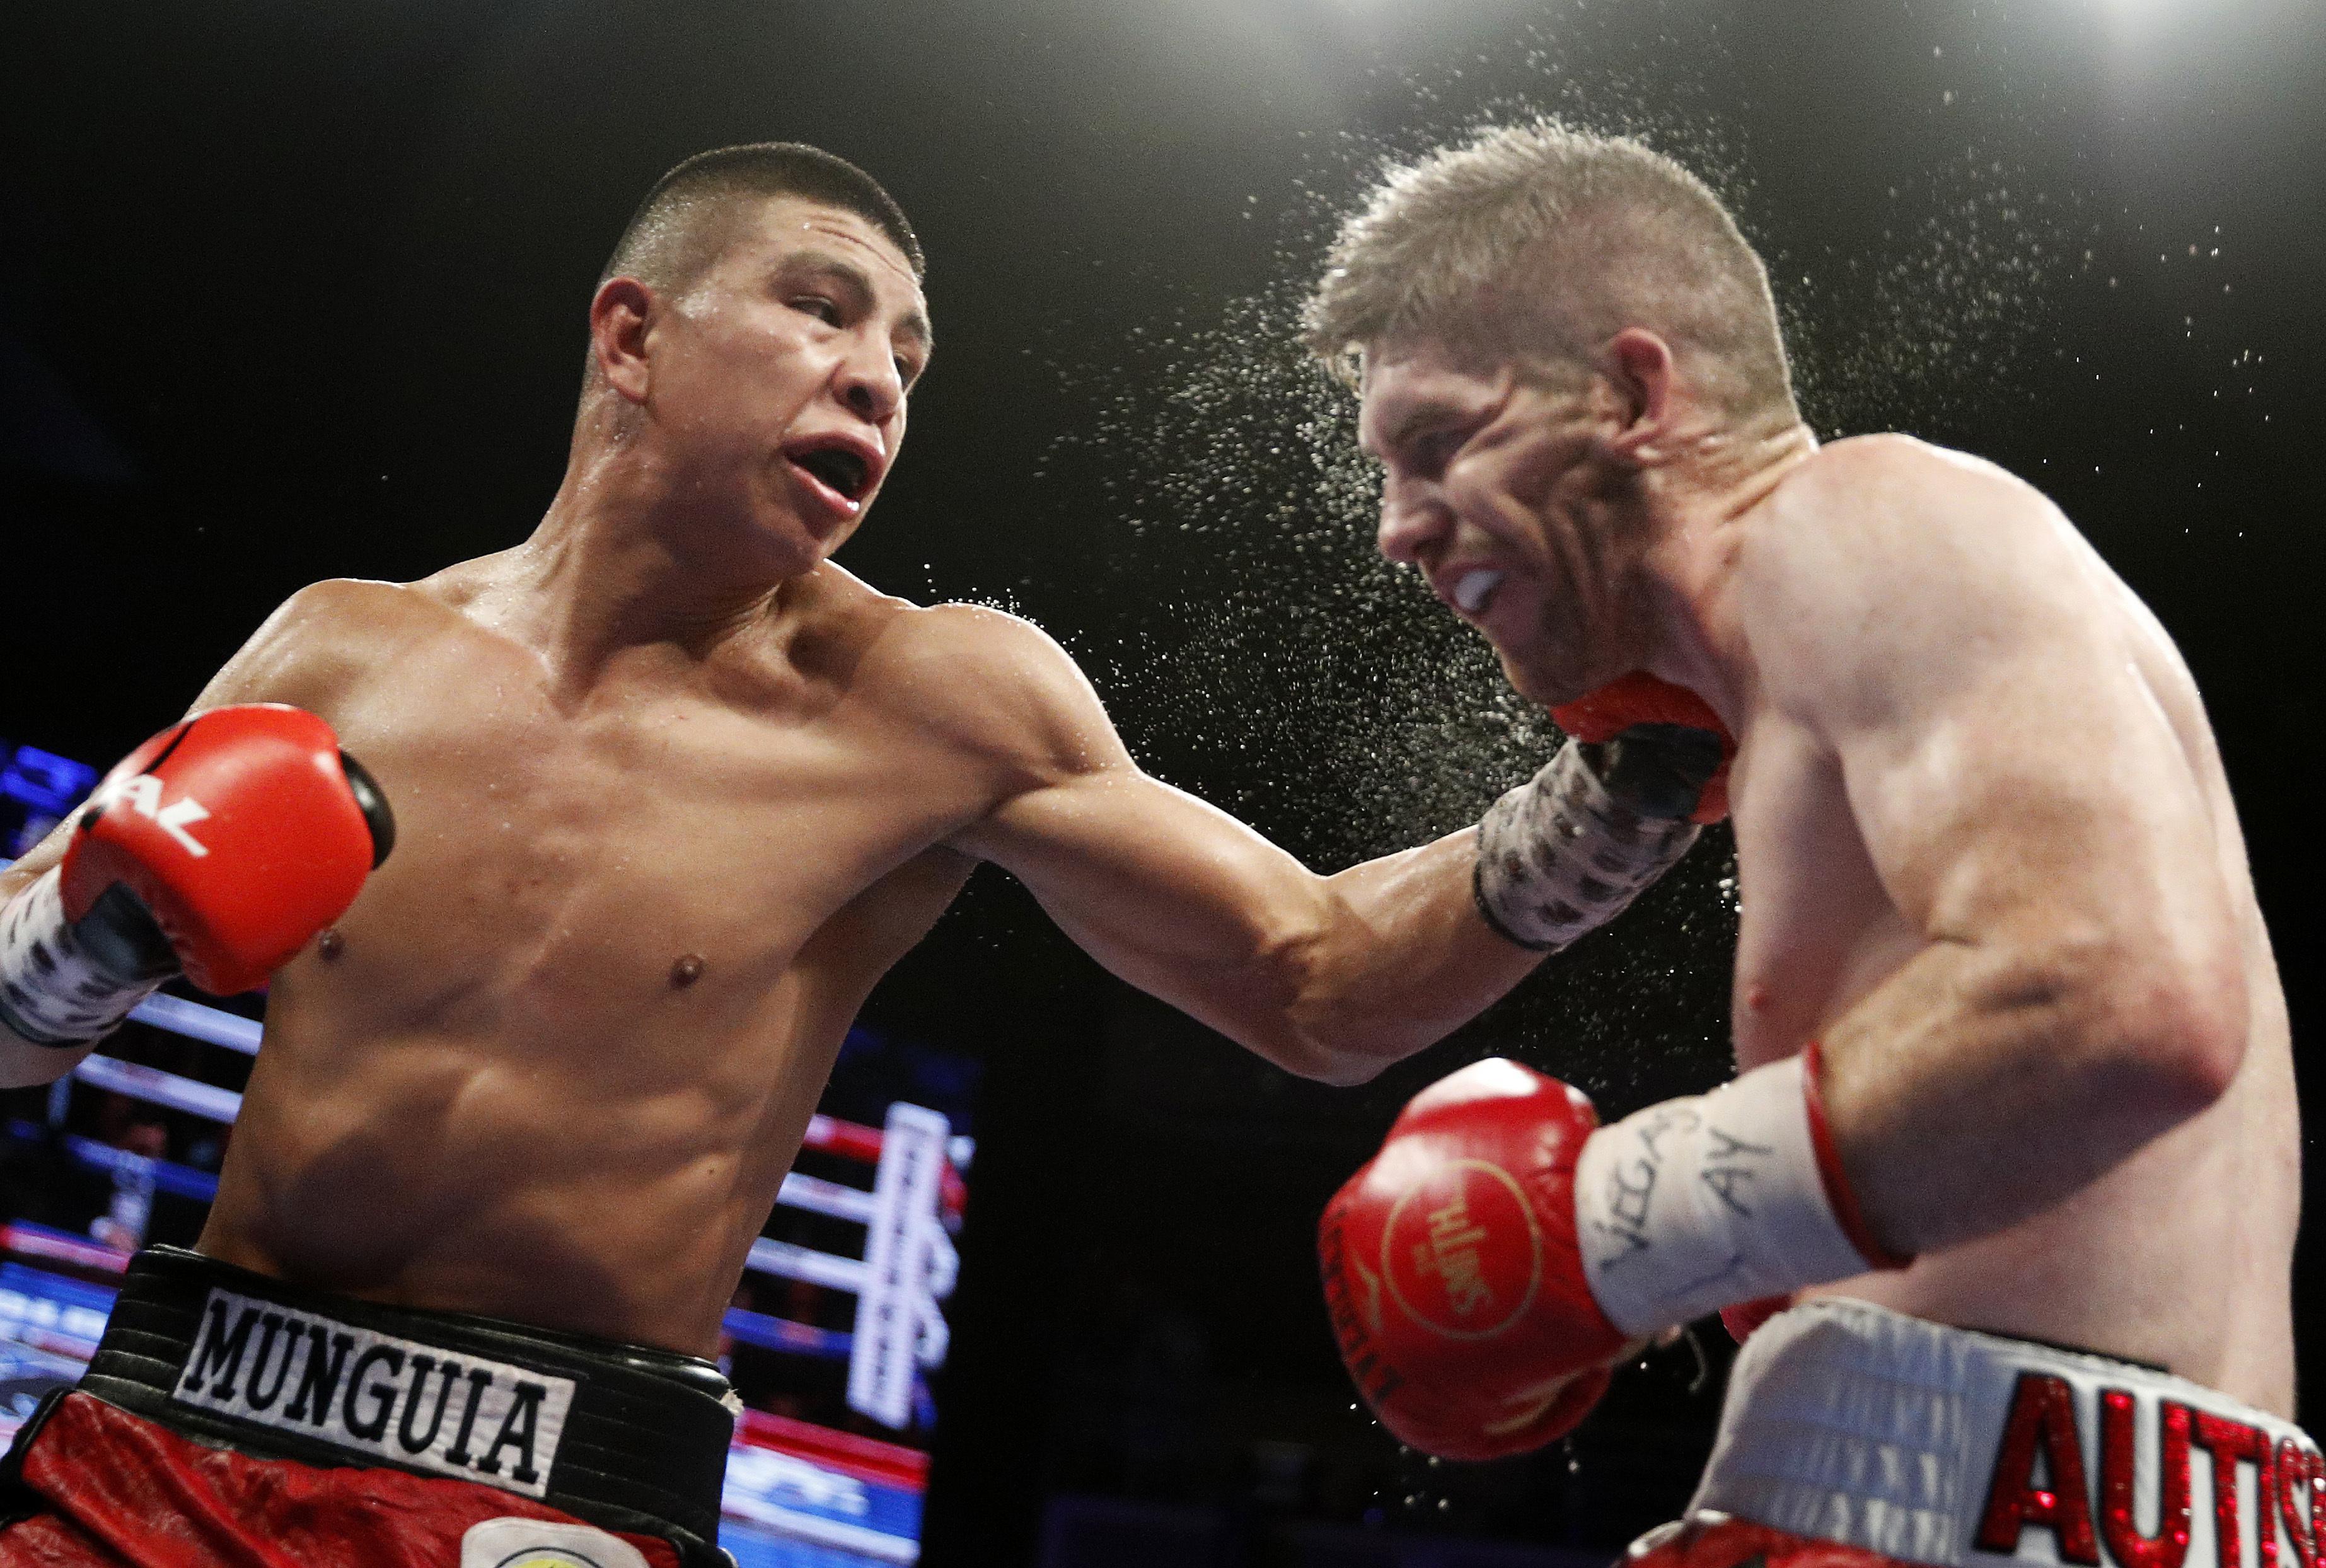 Jaime Munguia is unbeaten in 30 fights